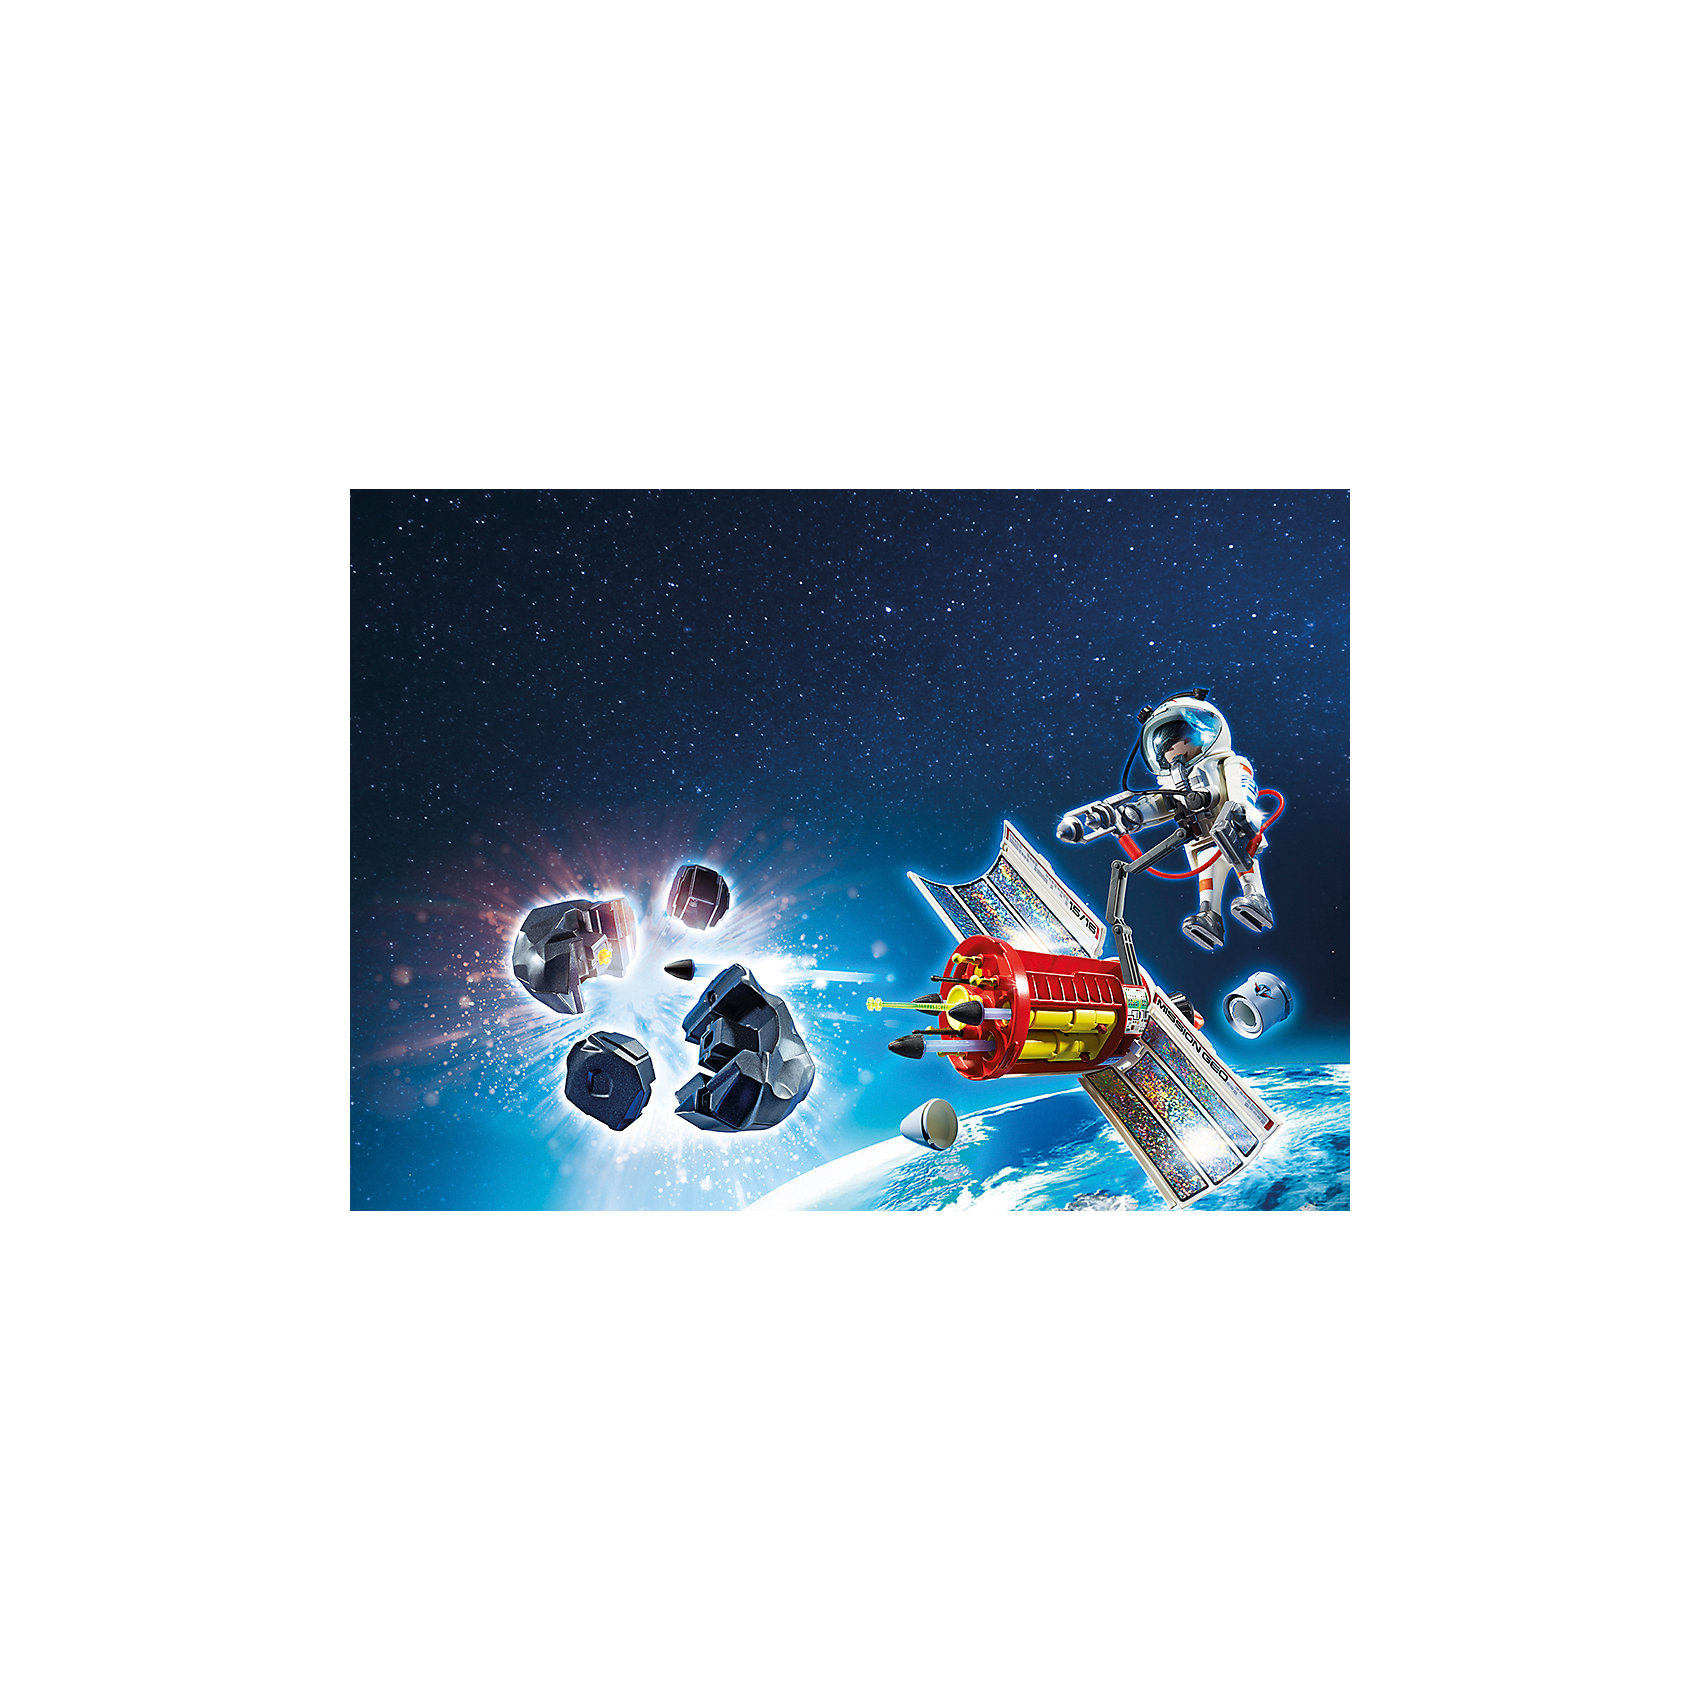 PLAYMOBIL® Космическая миссия: Спутниковый метеороидный лазер, PLAYMOBIL playmobil® зоопарк стая фламинго playmobil